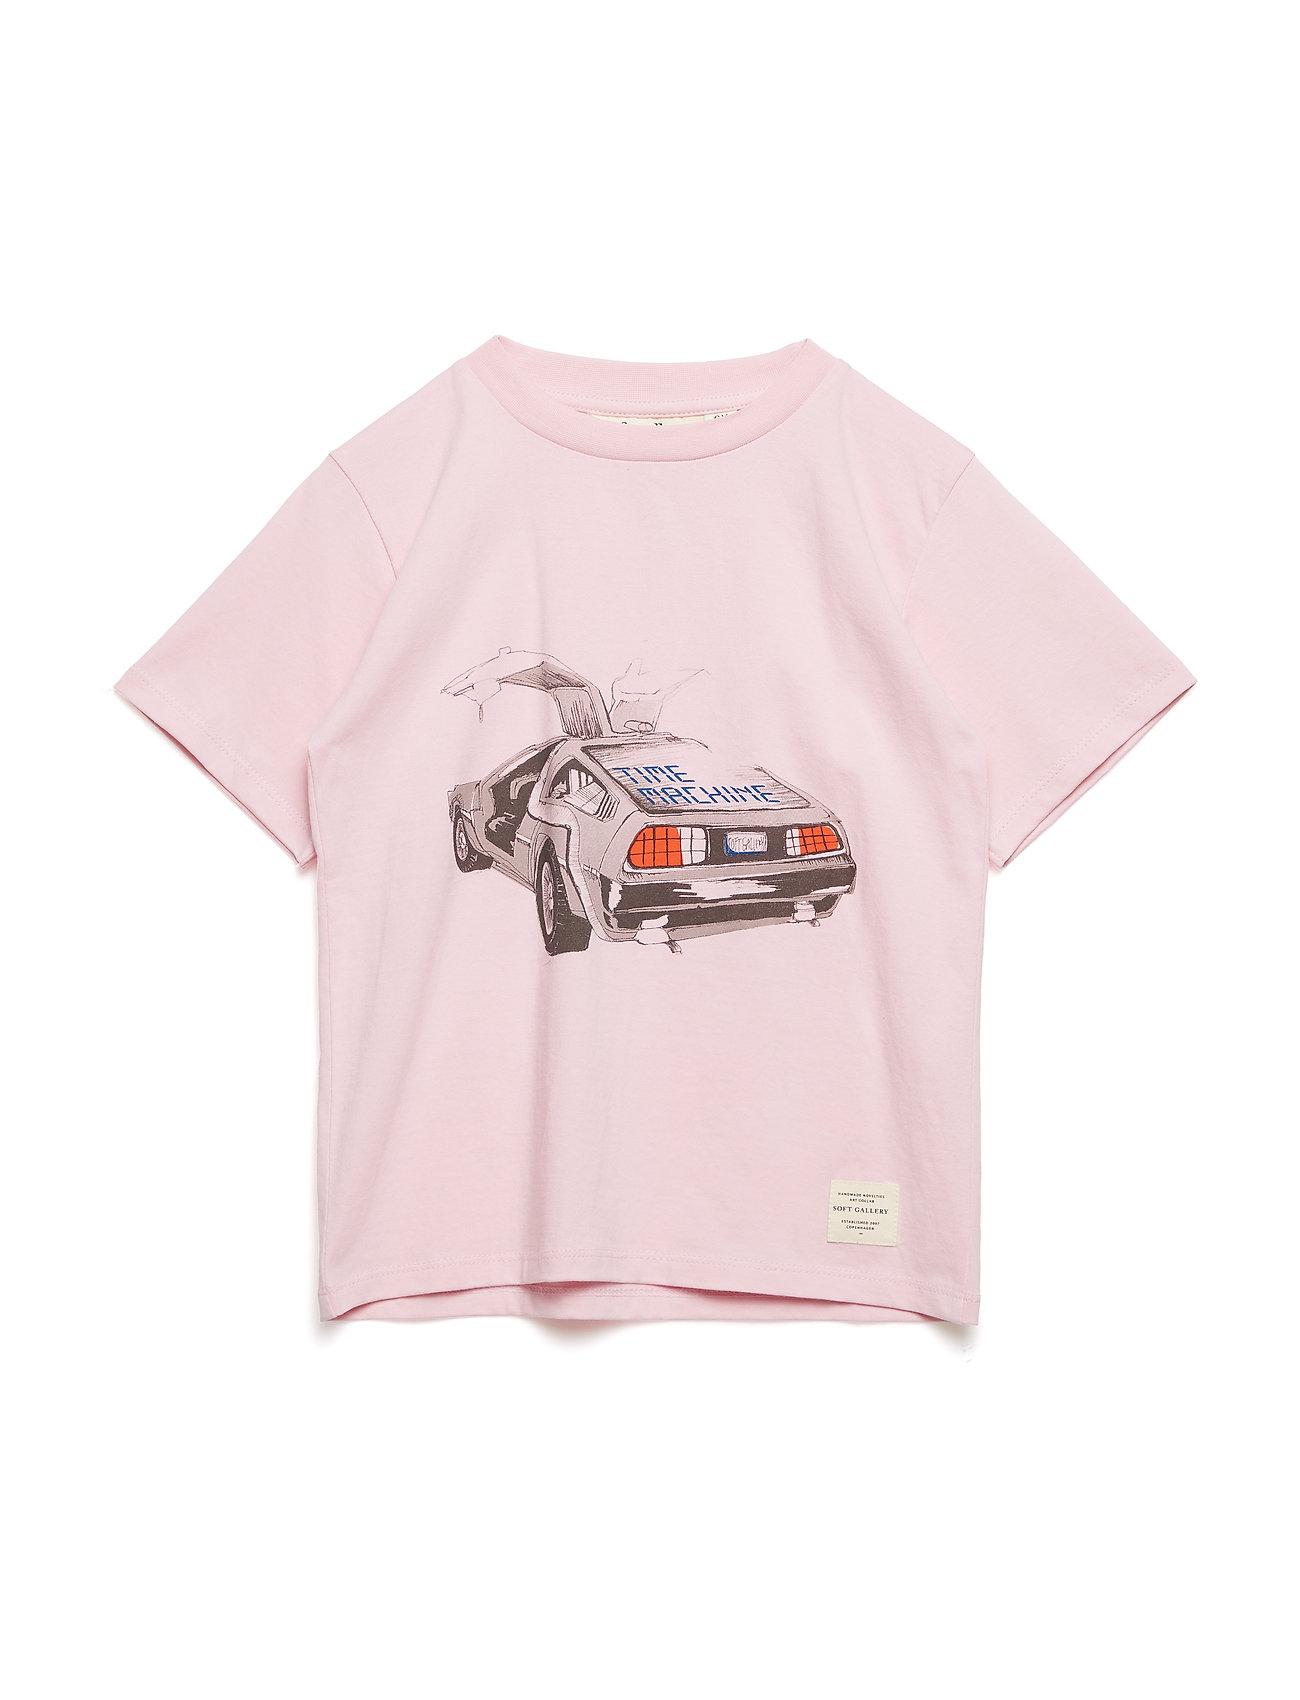 Soft Gallery Asger T-shirt - PARFAIT PINK, DELOREAN